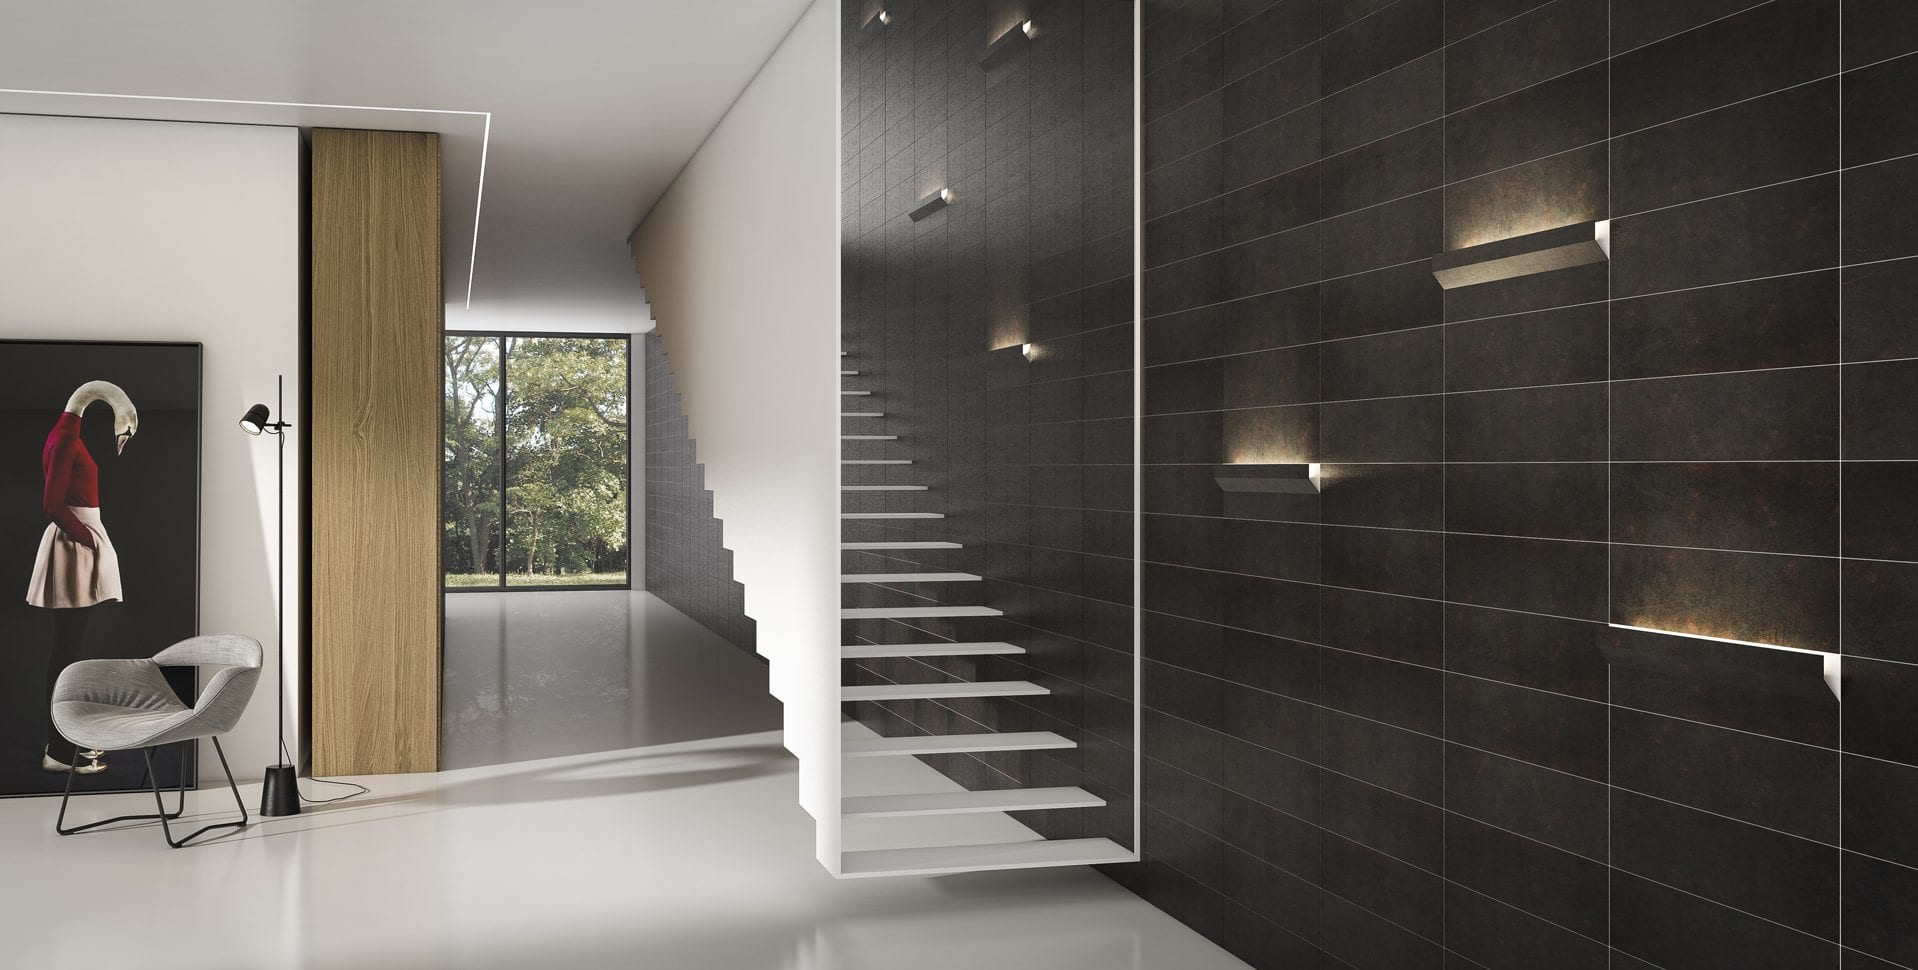 Maayan-Golan_Architectural-Visualization_product-visualization_wall-tiles_lighting-fixture_itai-bar-on_stairs_07